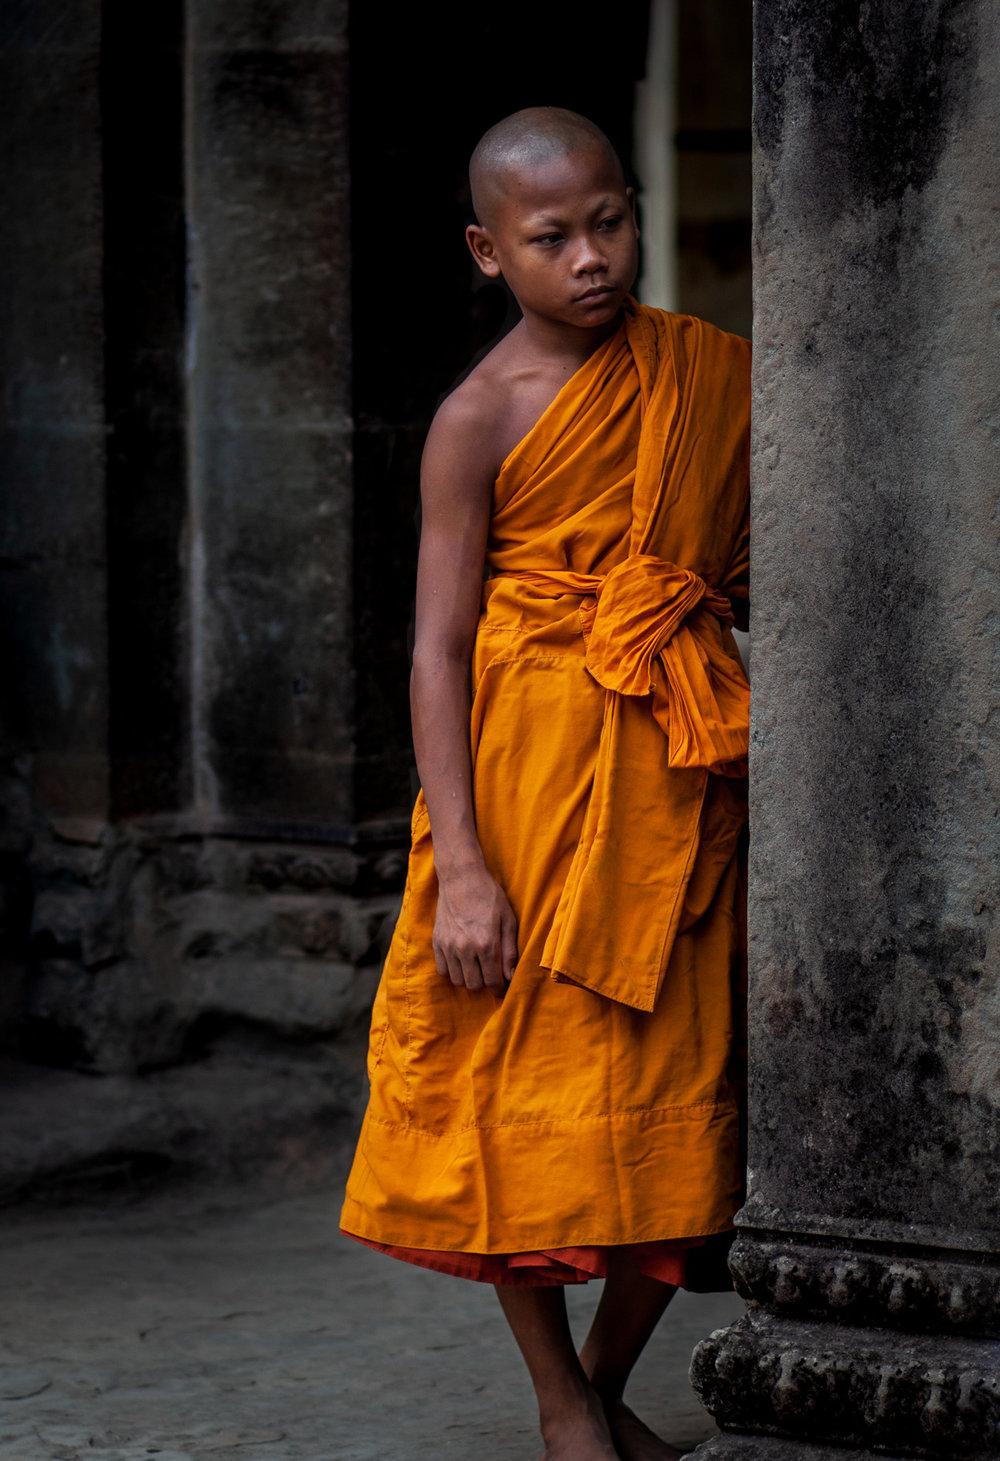 Cambodge - 2017